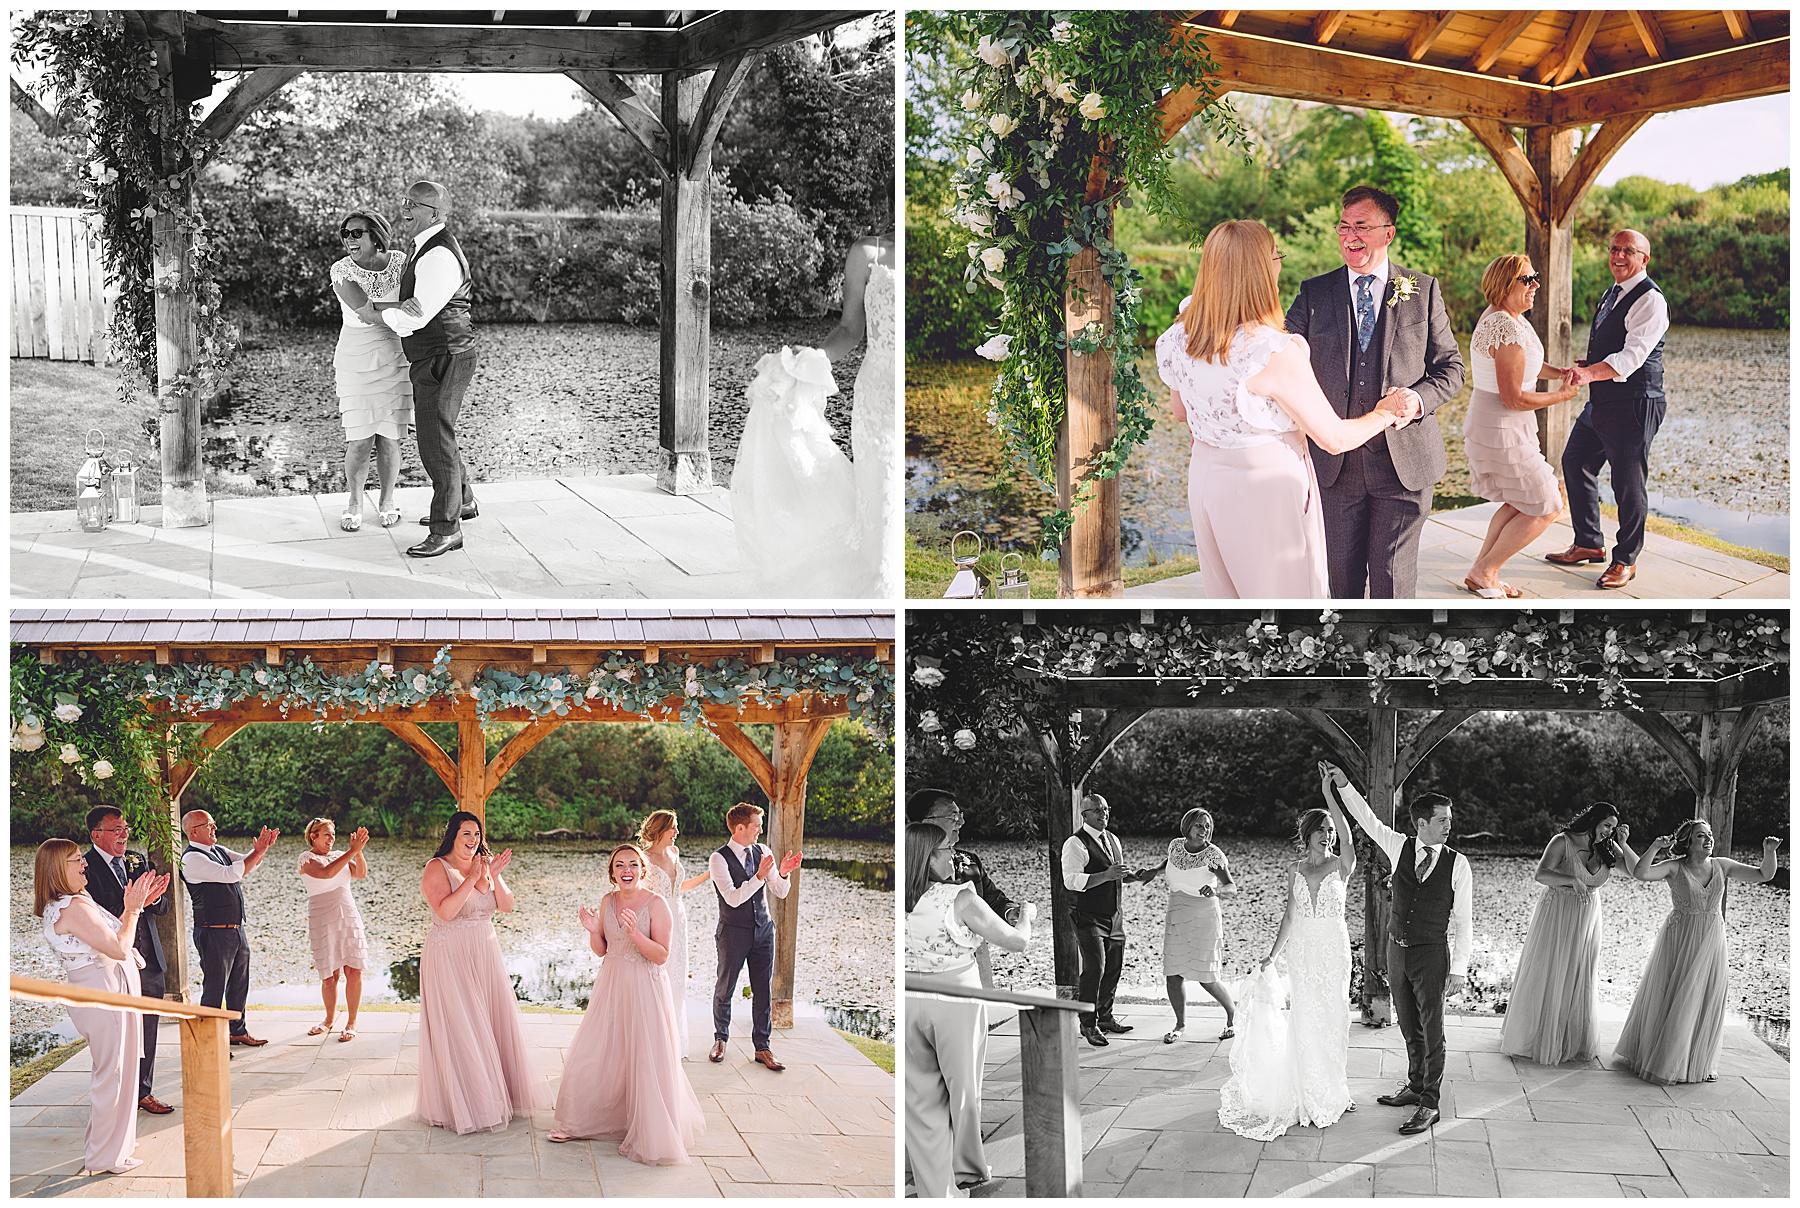 Wedding celebrations at Oldwalls Gower